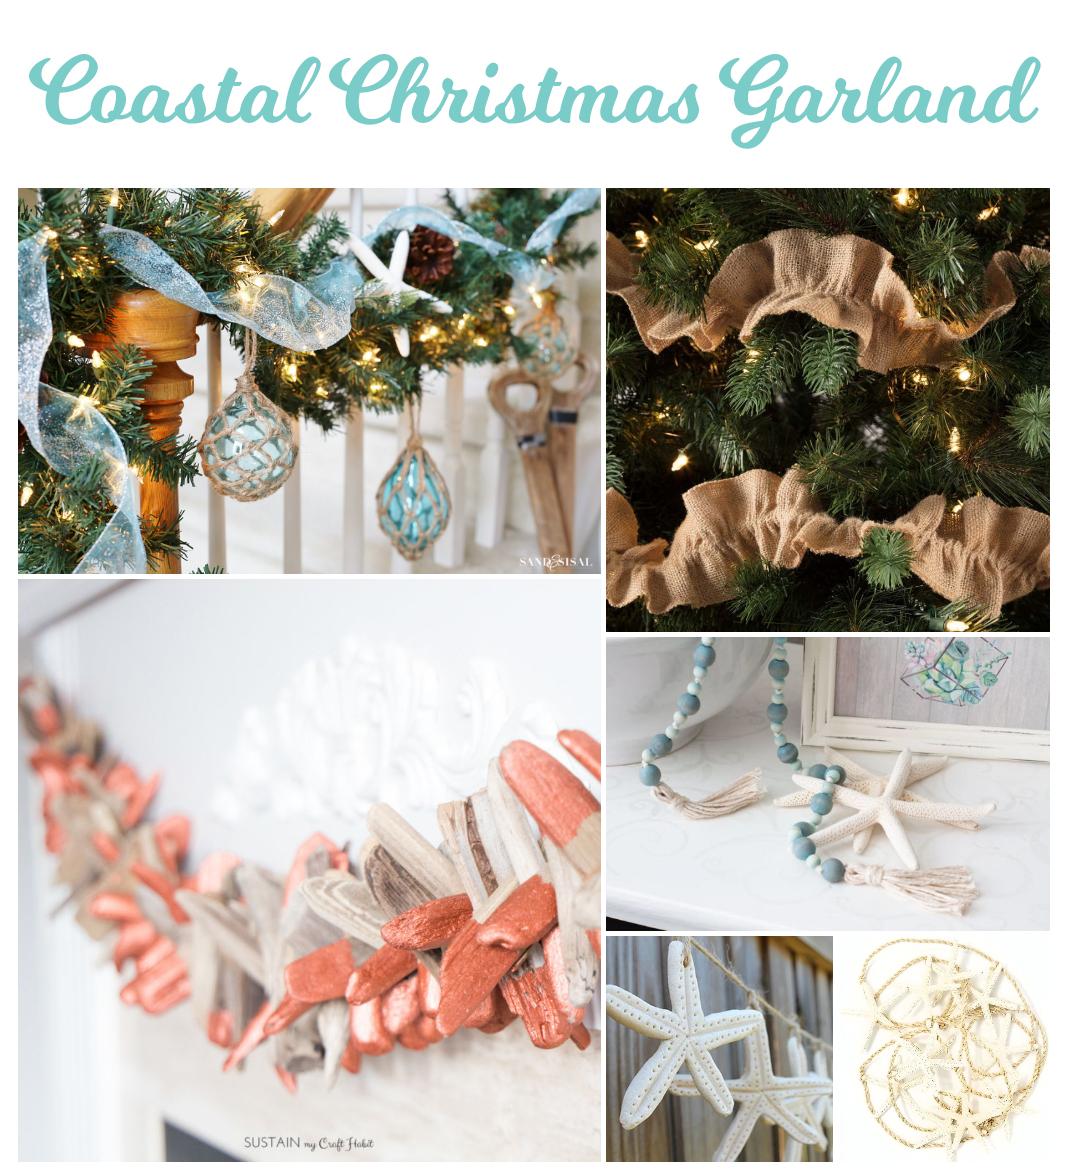 100 Coastal Christmas Decor Ideas - Garland